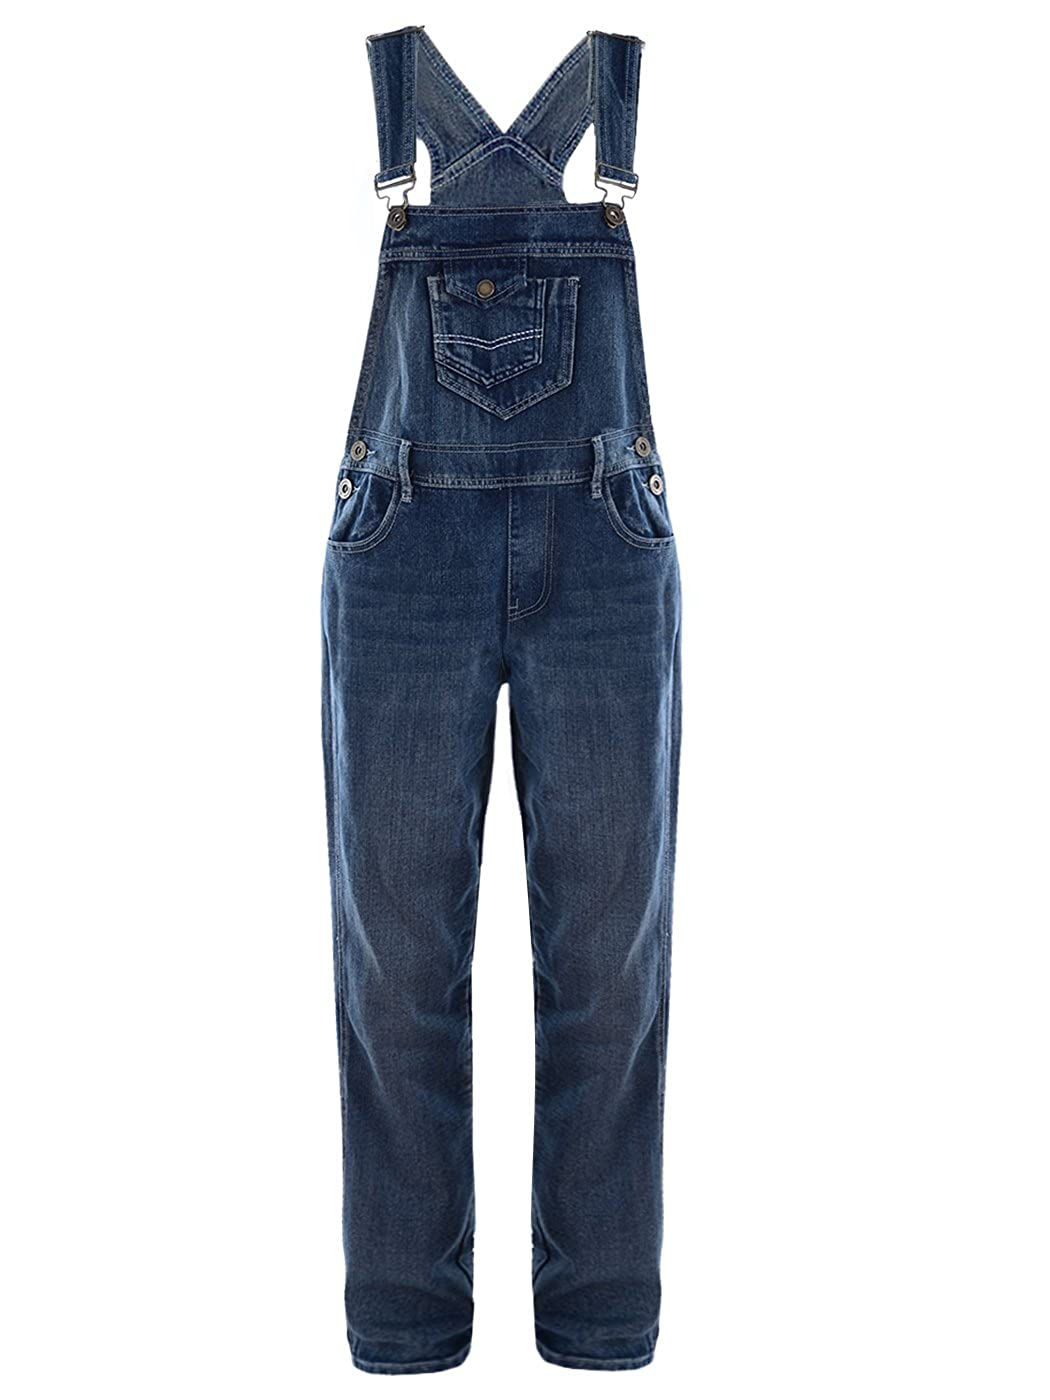 Anna-Kaci Womens Blue Denim Jean Straight Leg Distressed Pocket Bib Overalls Y92717-M/LDE